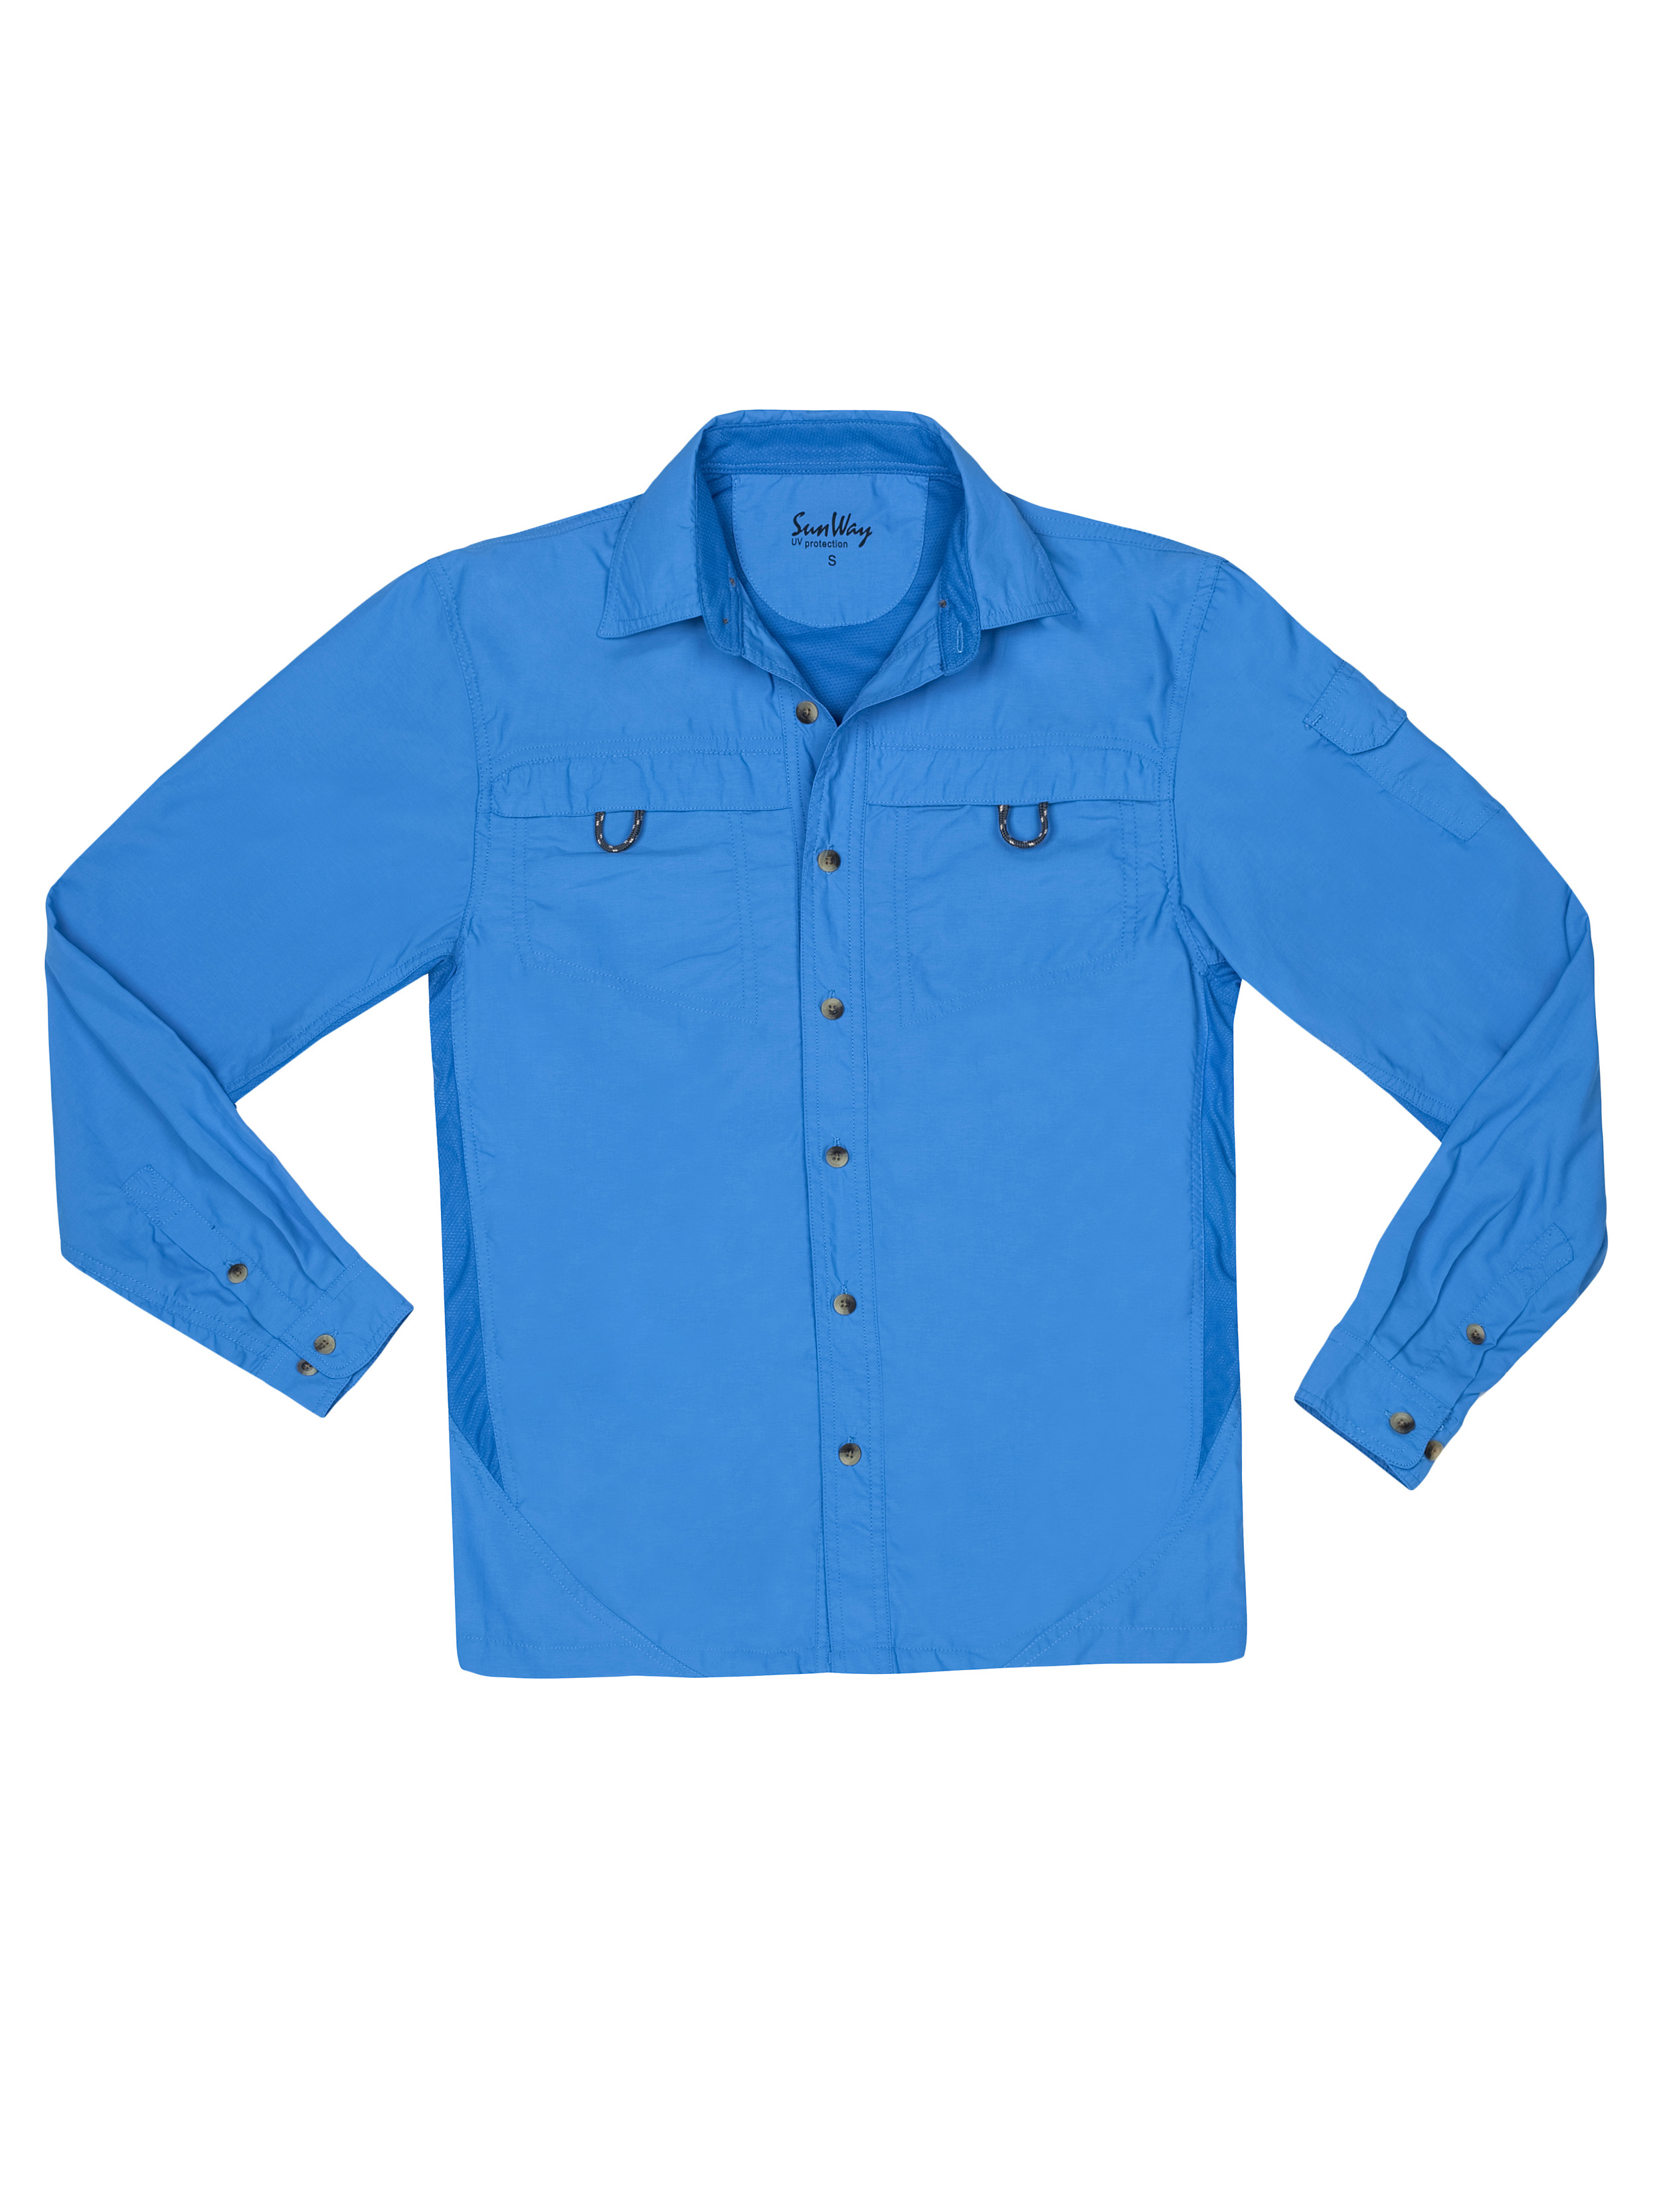 Sunway 39 s men optimic blue uv outdoor shirt for Custom sun protection shirts